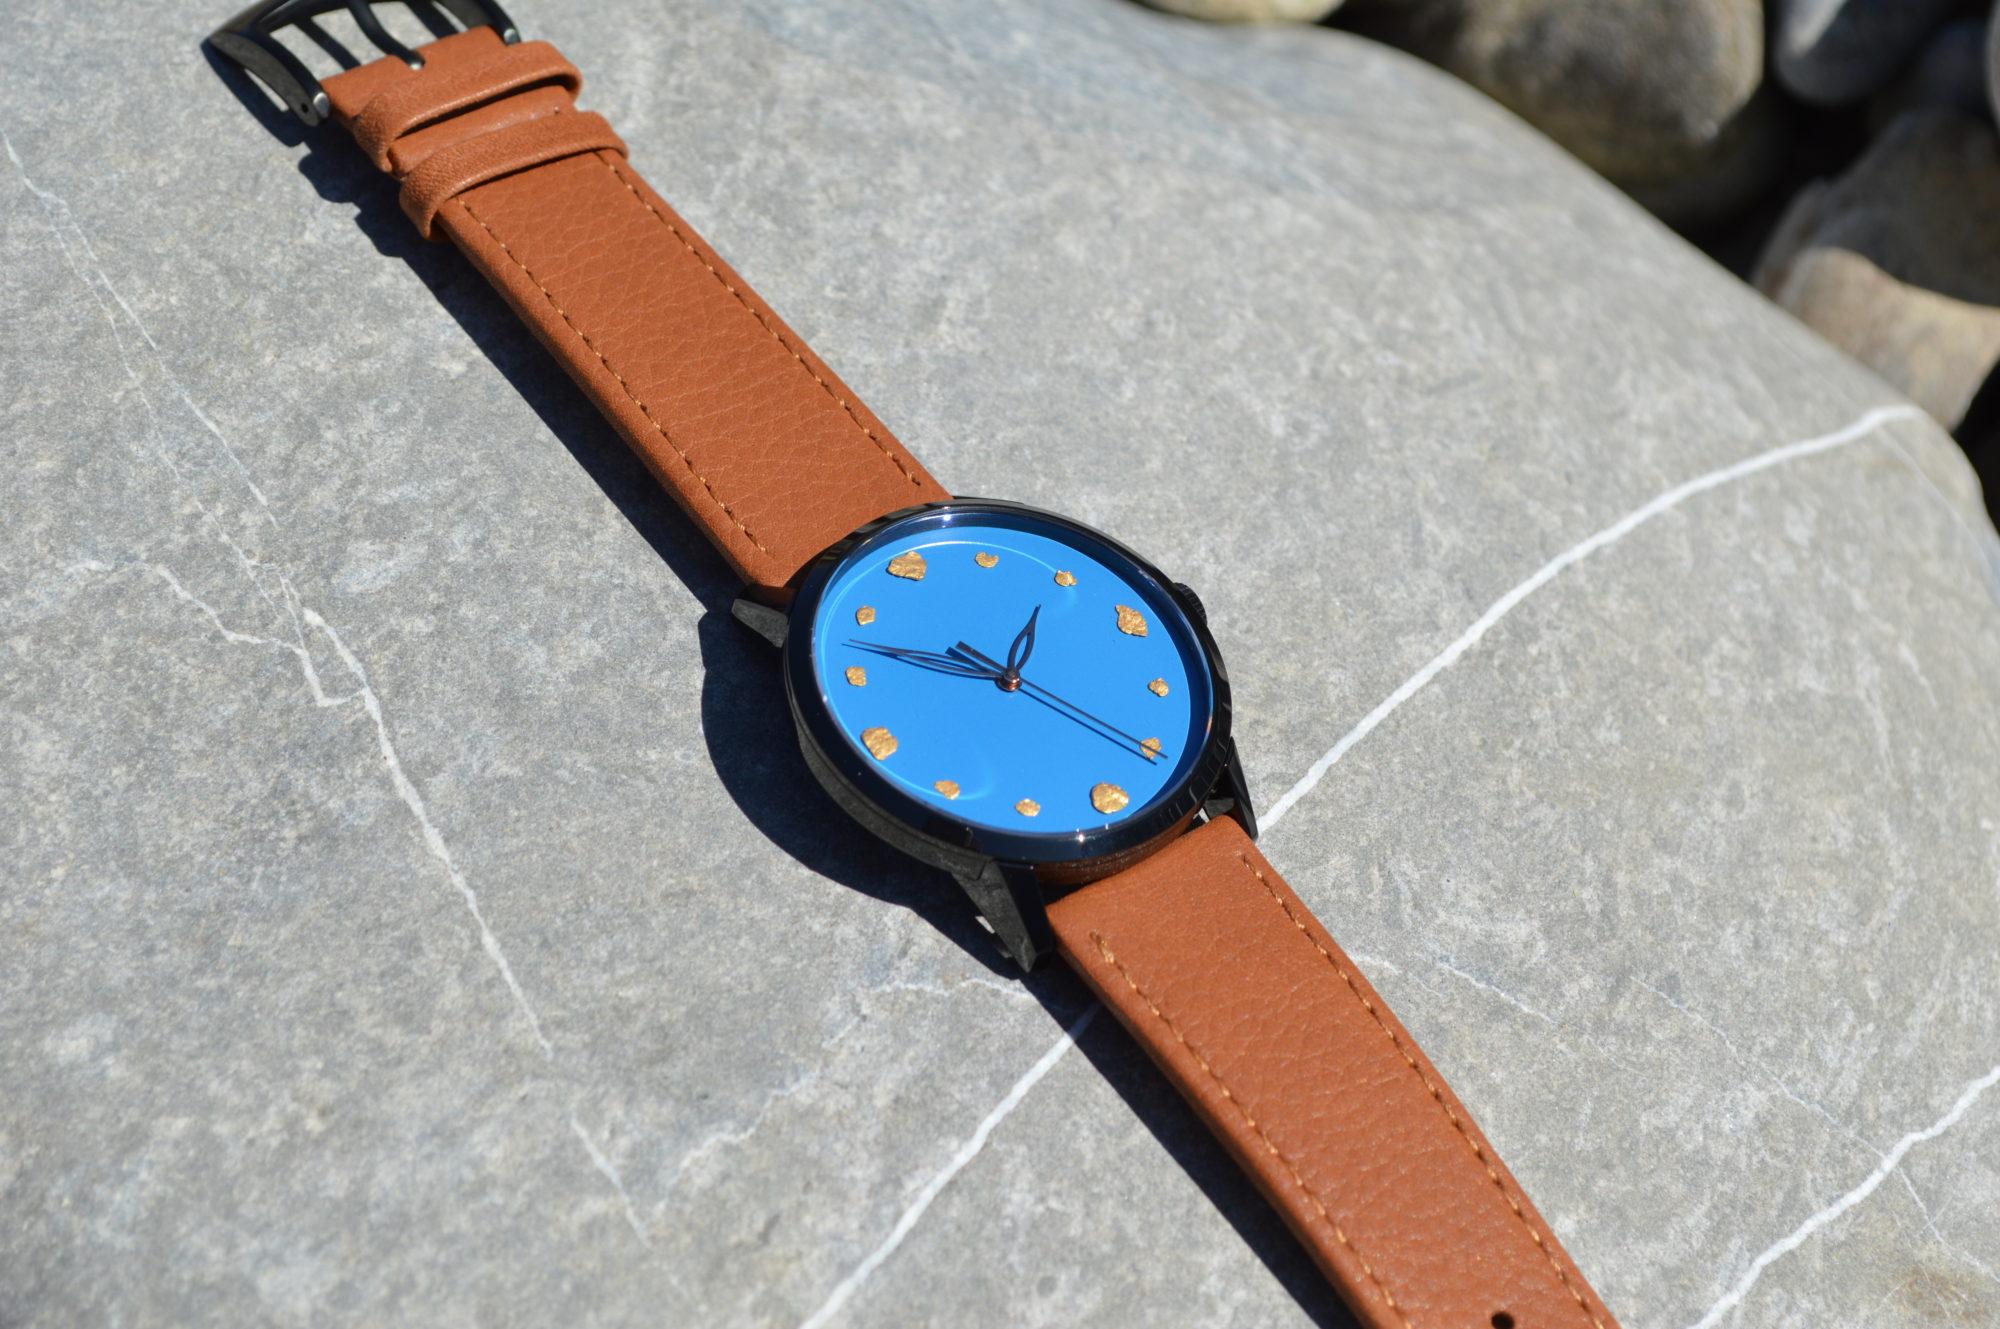 The Swiss Mountain Gold Watch